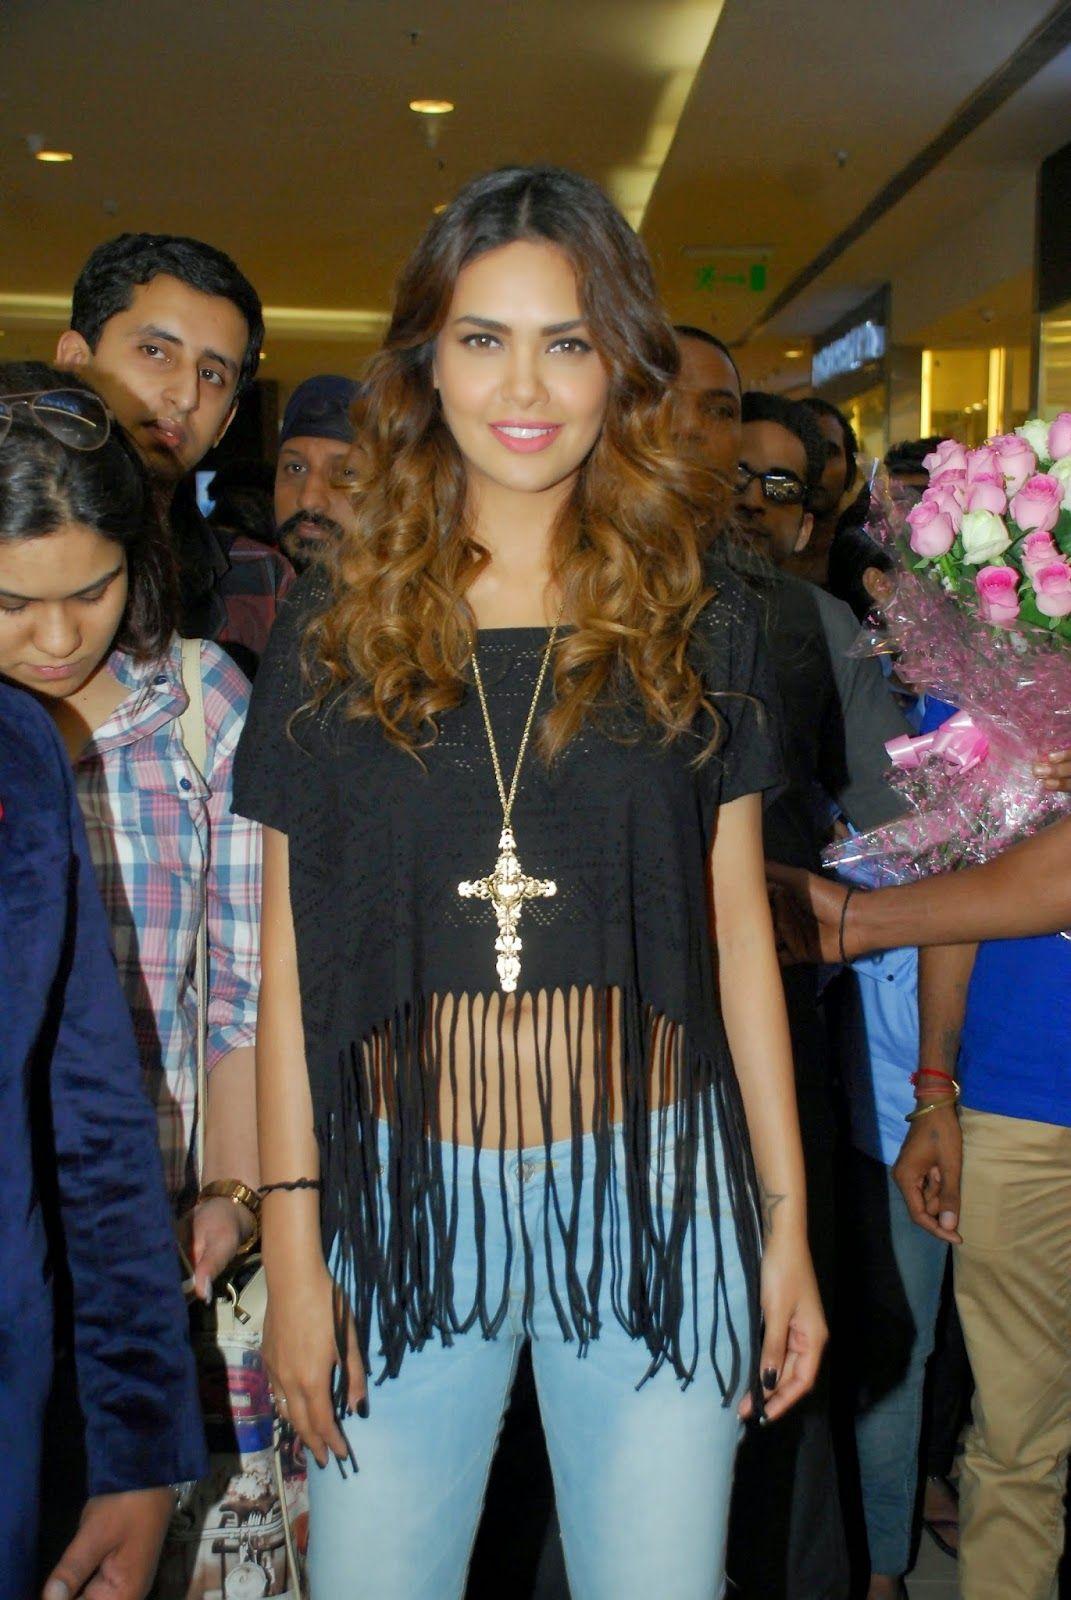 High Quality Bollywood Celebrity Pictures: Esha Gupta